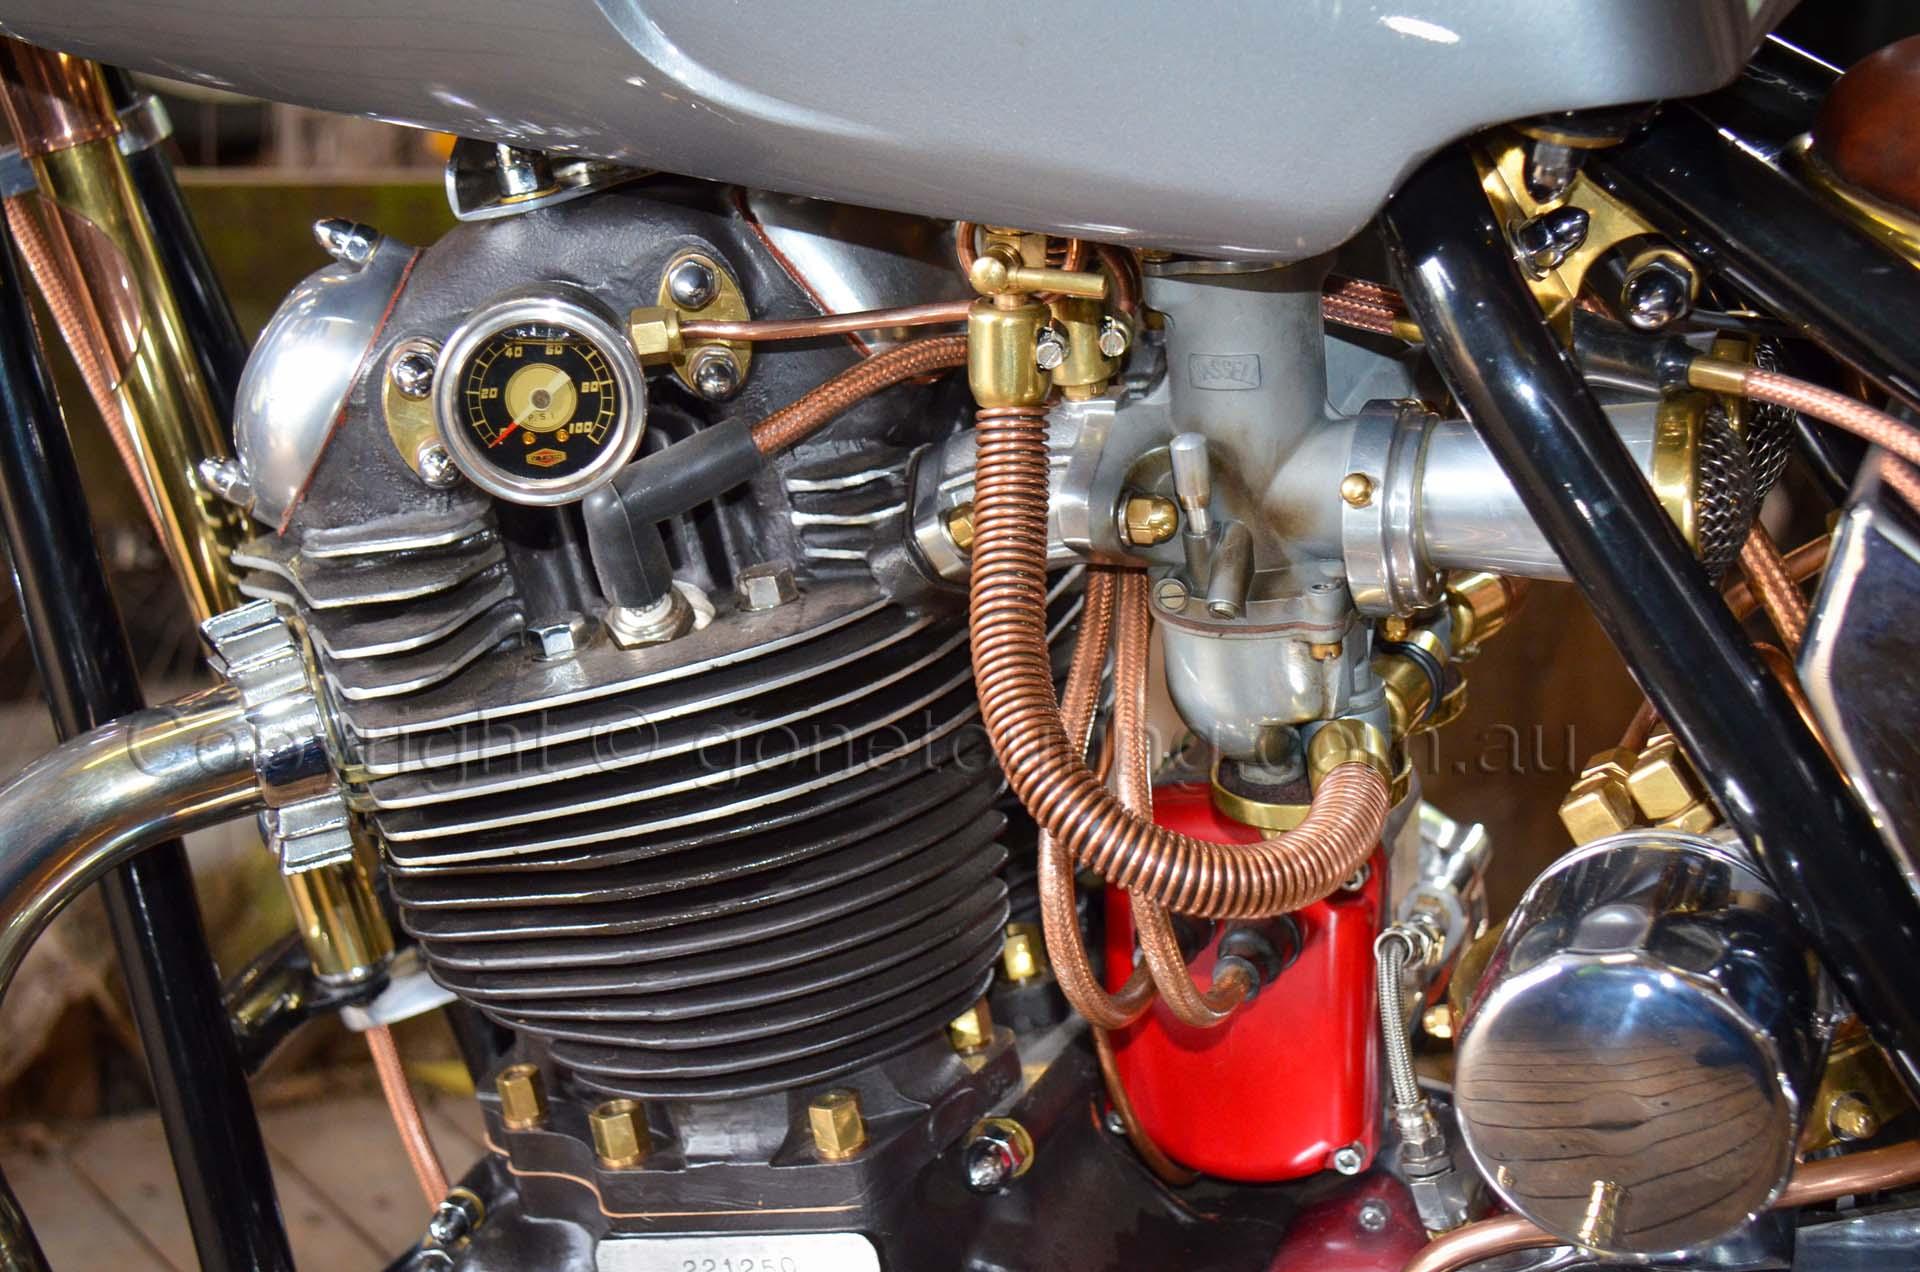 The custom 750cc Norton Commando Engine